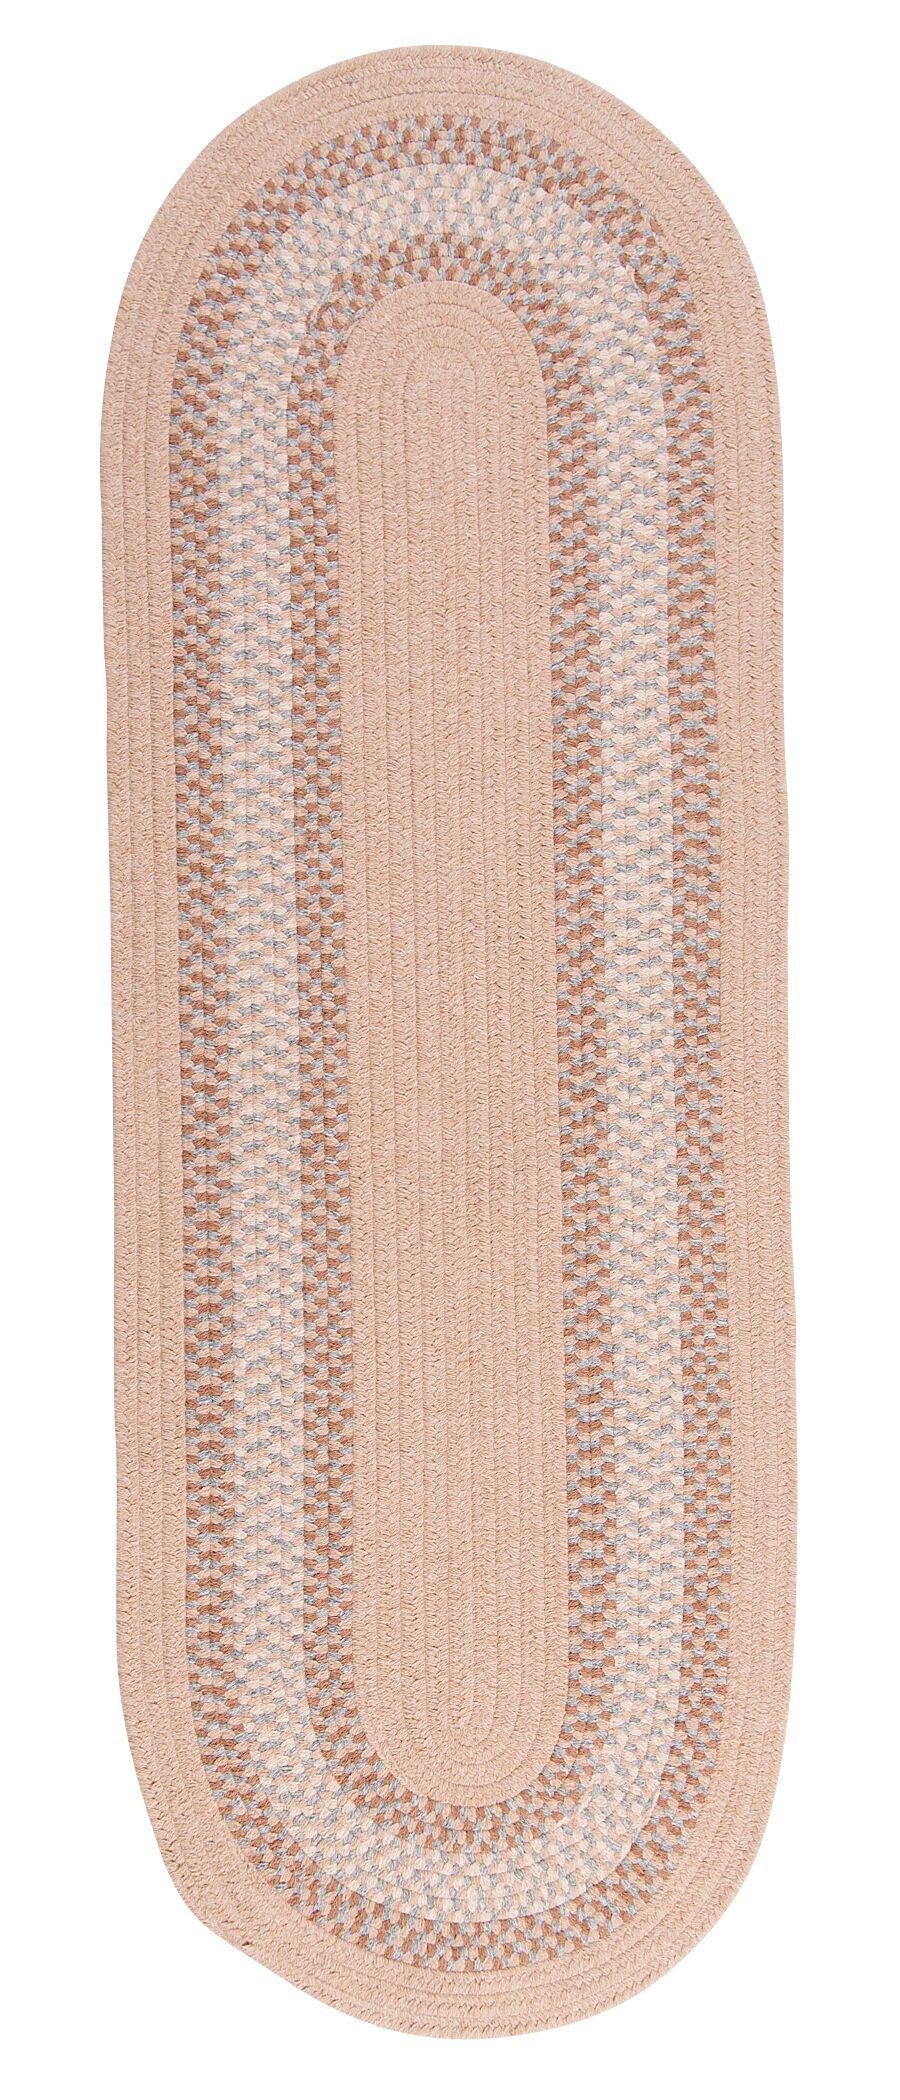 Serafin Oatmeal Area Rug Rug Size: Oval Runner 2' x 10'